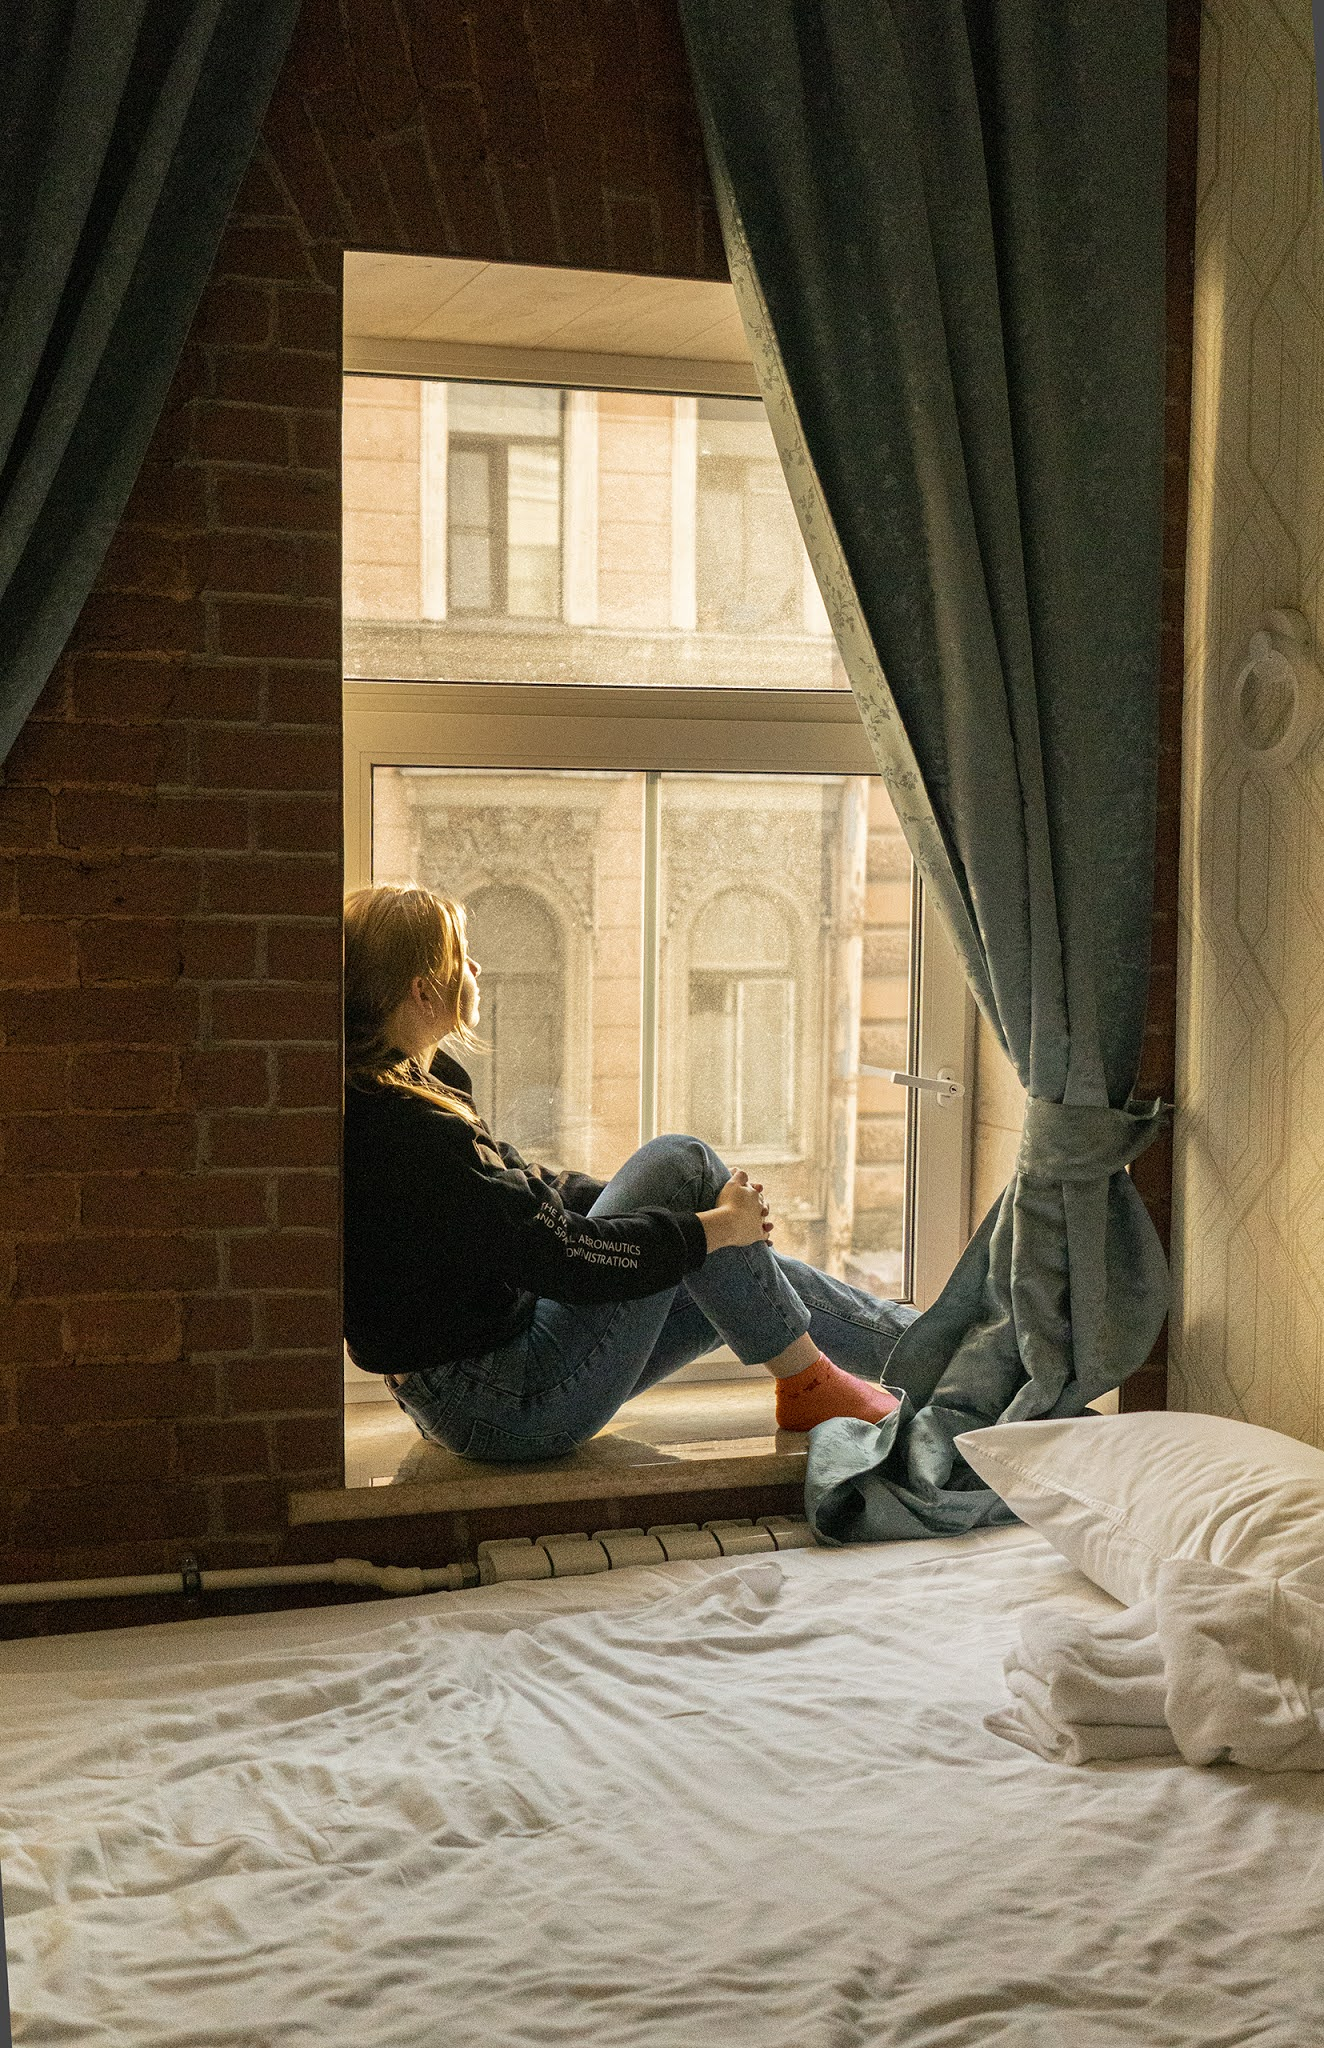 photo Igor Novik St. Petersburg atmosphere sitting on the window sun avenue cozy interiors girl on the window girl on the window seeing off St. Petersburg dreams